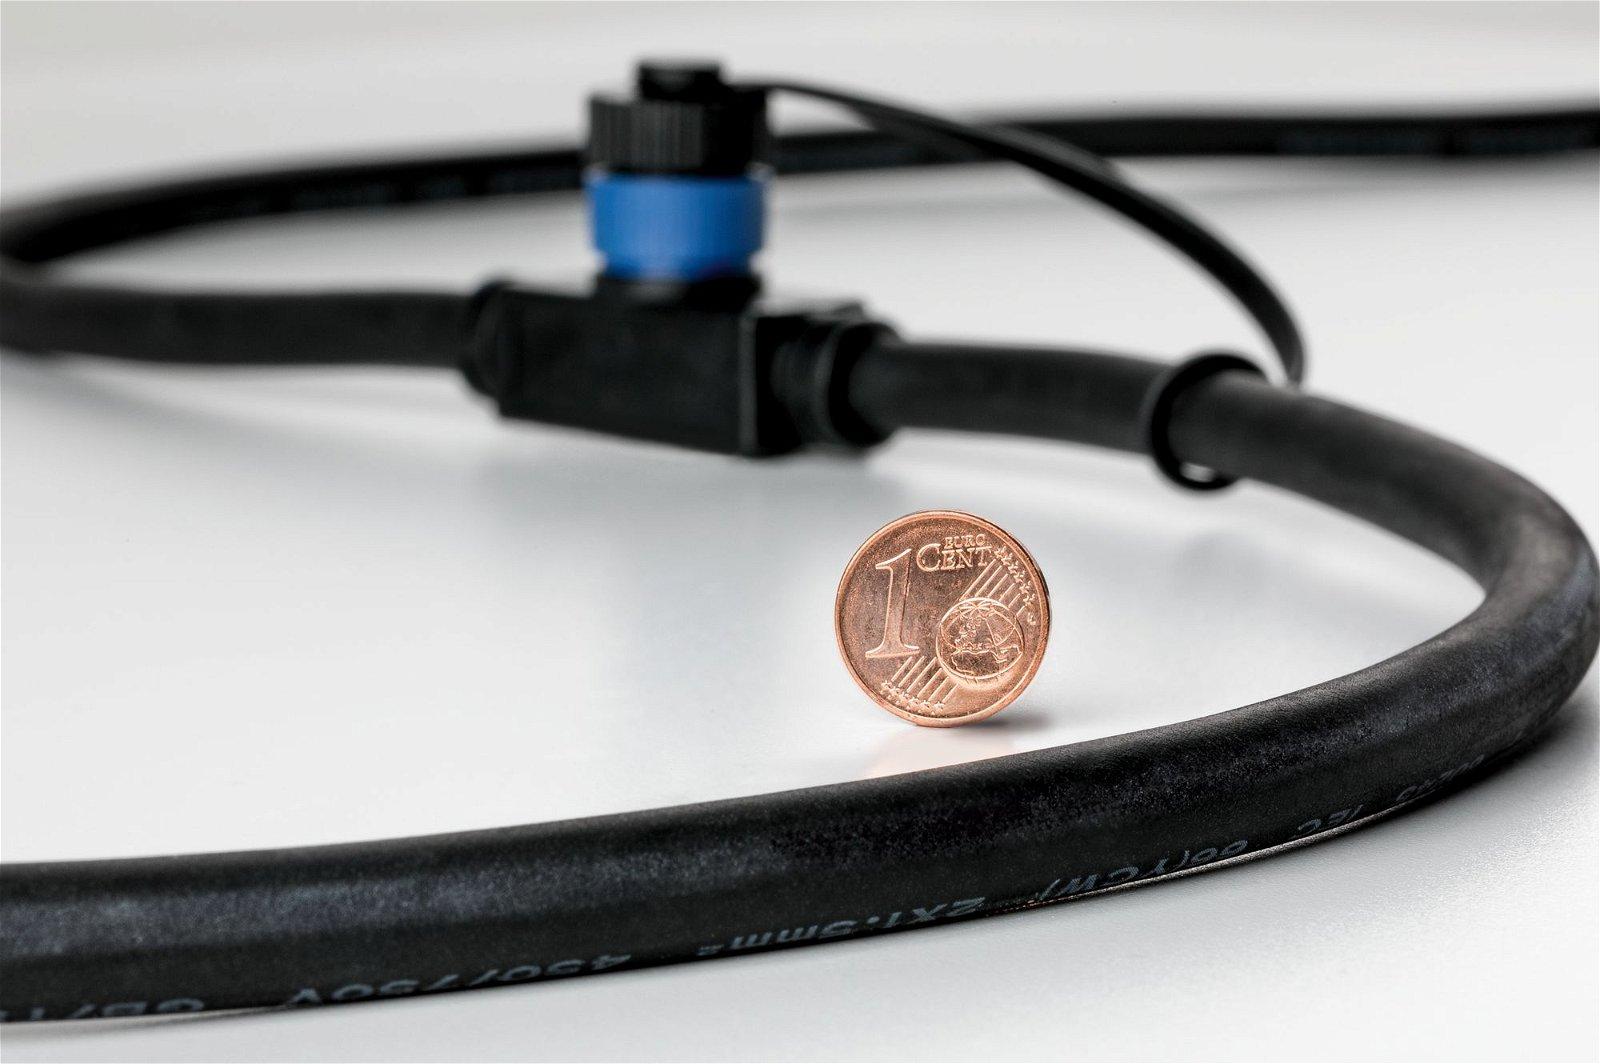 Plug & Shine LED Bodenaufbauleuchte Lichtleiste IP67 eckig 856x52mm 3000K 8W 875lm 24V Anthrazit Alu Druckguss